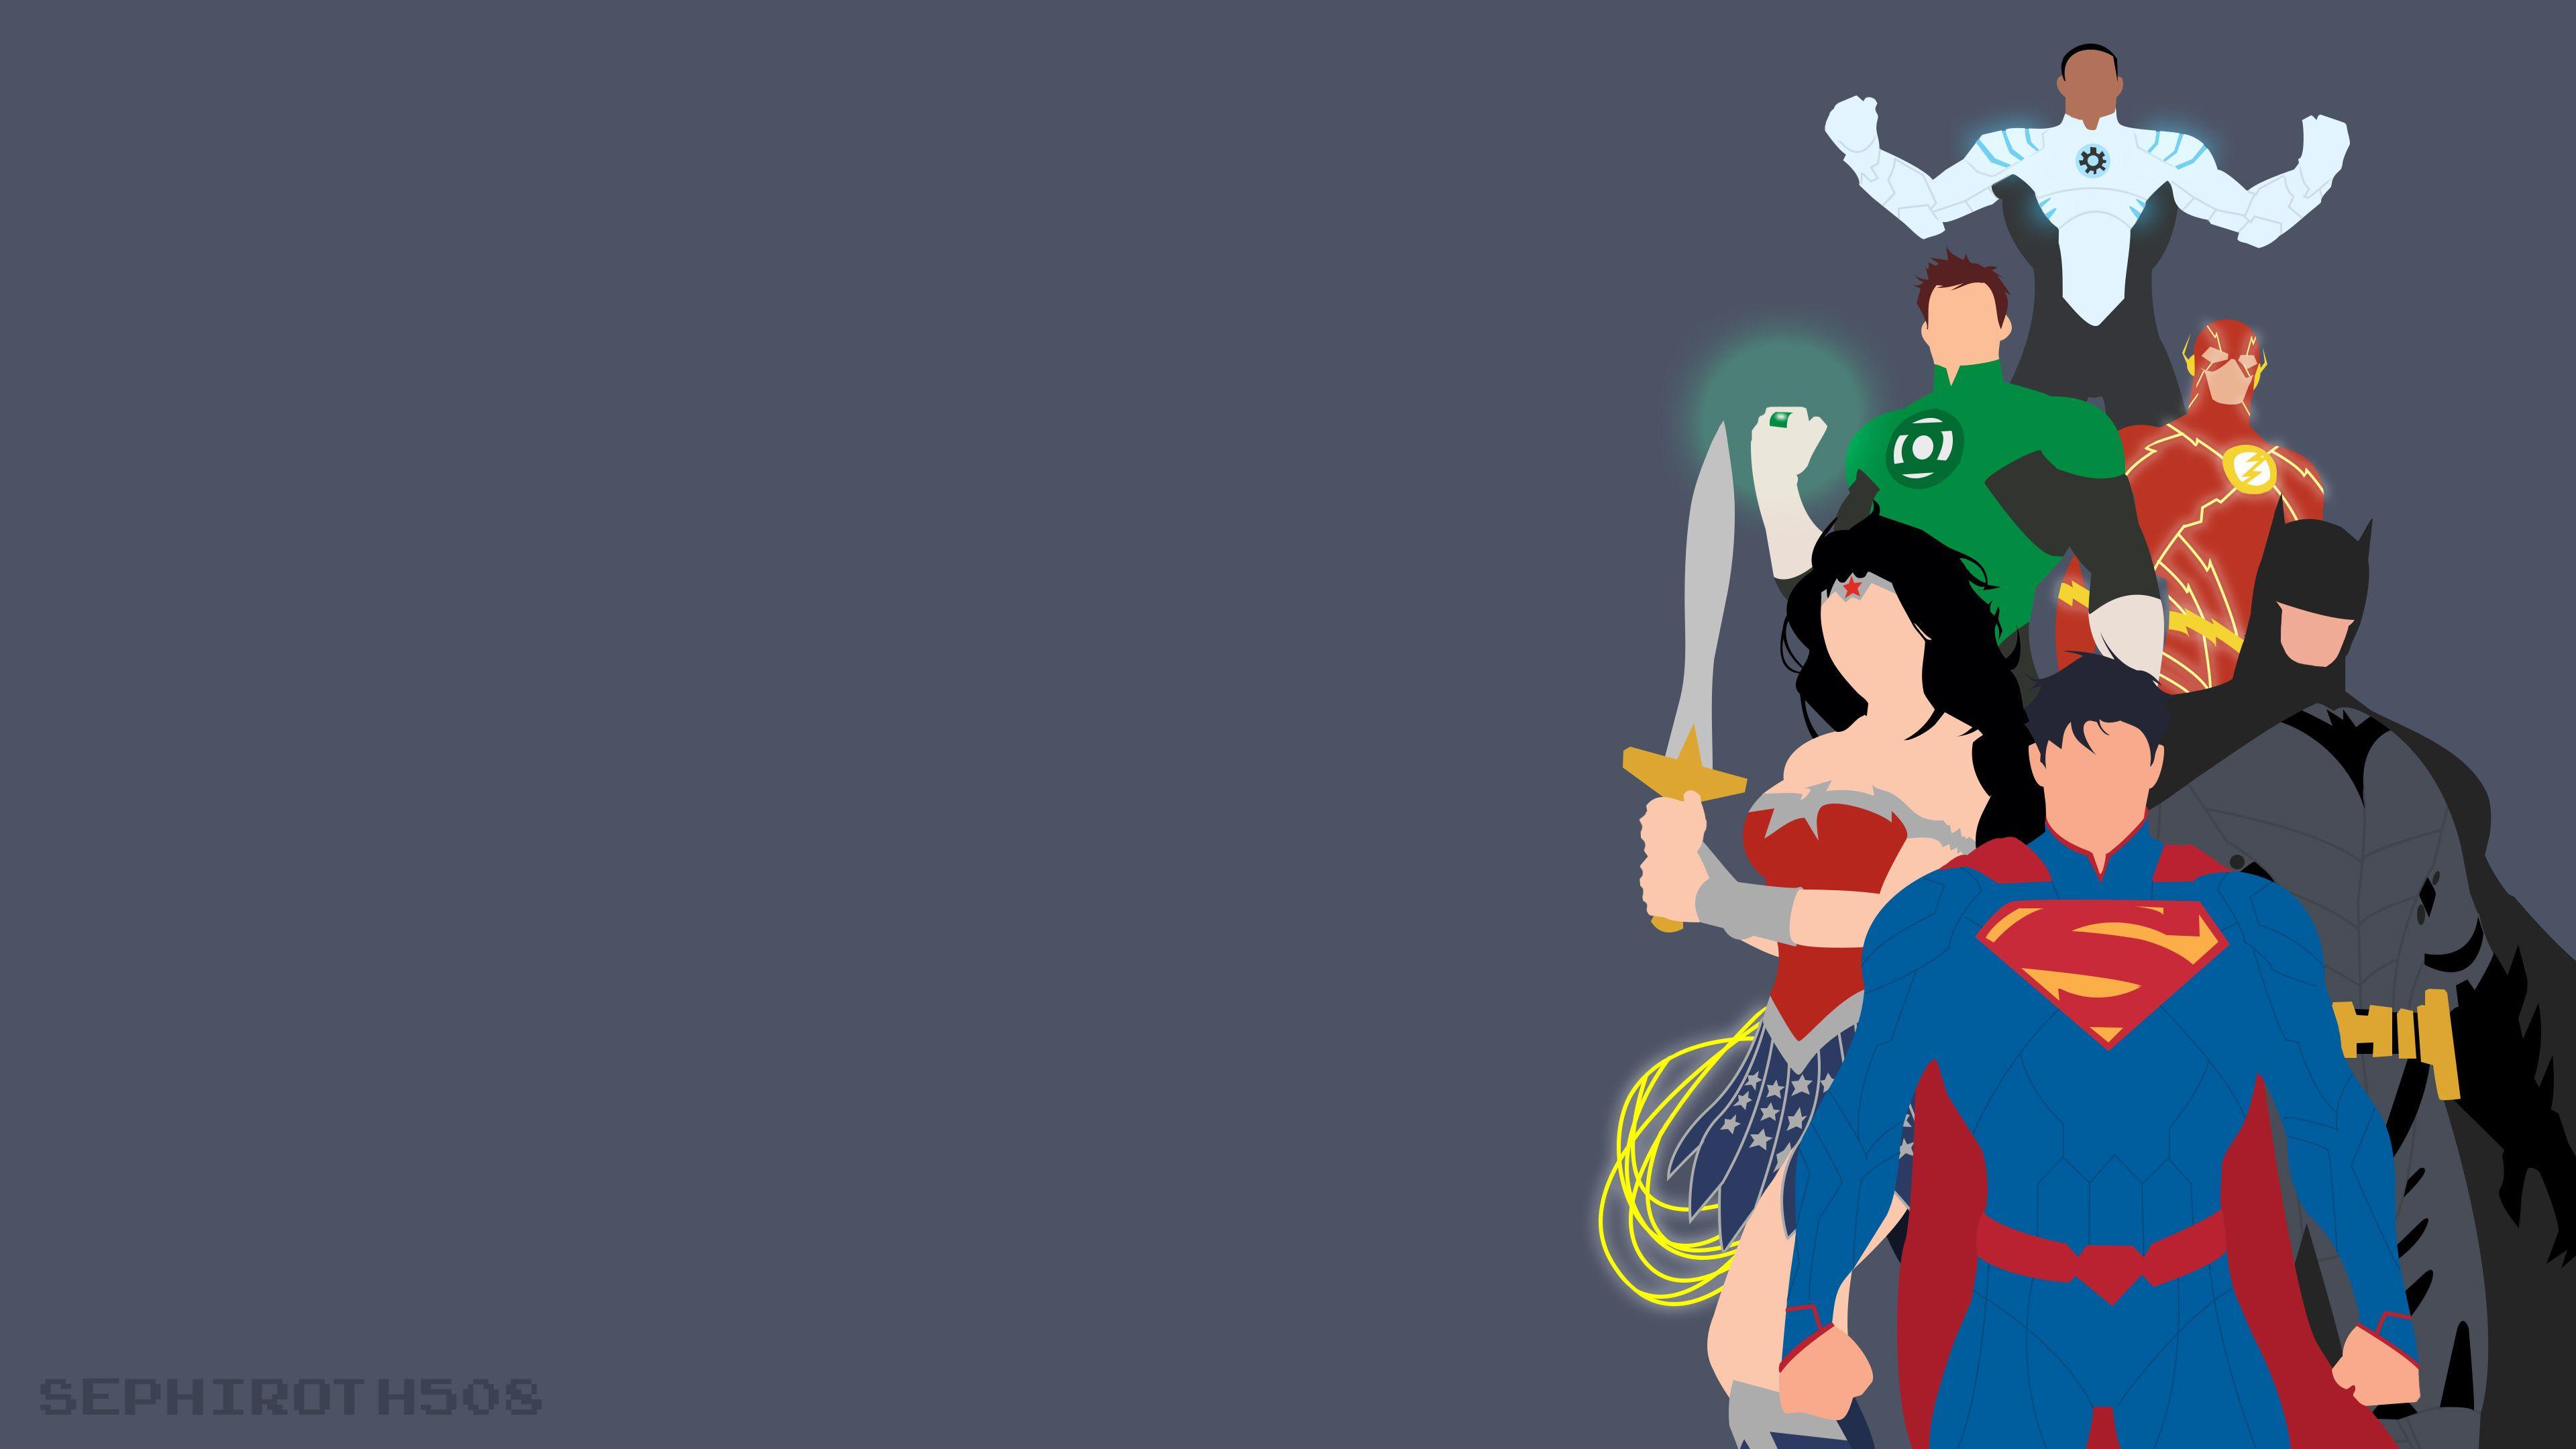 Justice League Minimalist Wonder Woman Wallpapers Superman Wallpapers Minimalism Wallpapers Justice League W Batman Wallpaper Justice League Flash Wallpaper